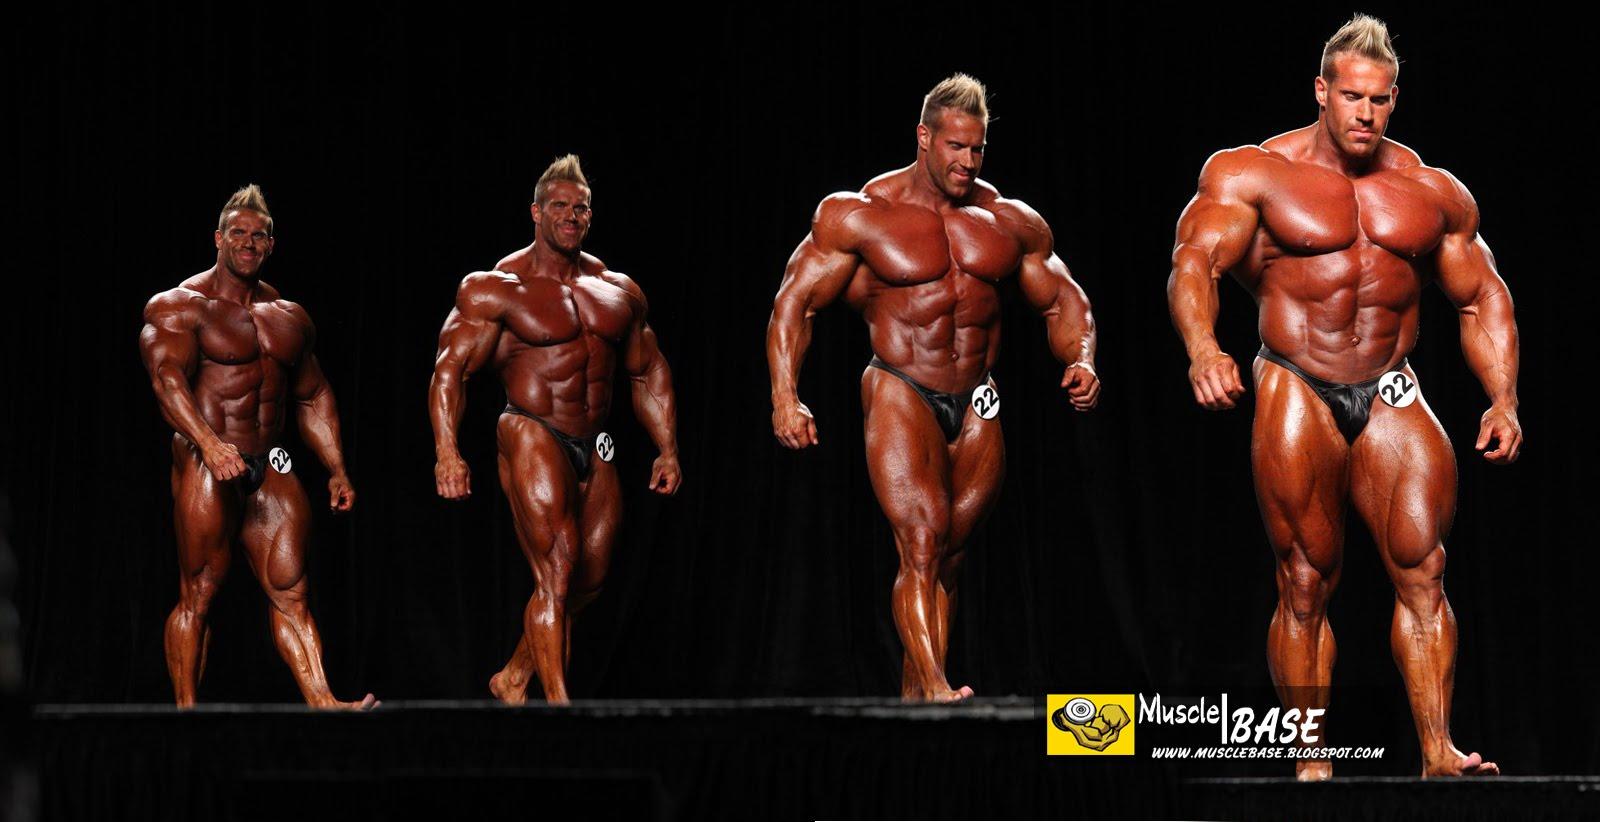 http://3.bp.blogspot.com/_mC1TEdZ4gks/TLLVtTc1uTI/AAAAAAAANwg/jC9uCmPObNU/s1600/Jay+Cutler+1st+Place+Winner+-+028+-+Mr+Olympia+Contest+2010+-+www.Musclebase.Blogspot.com.JPG